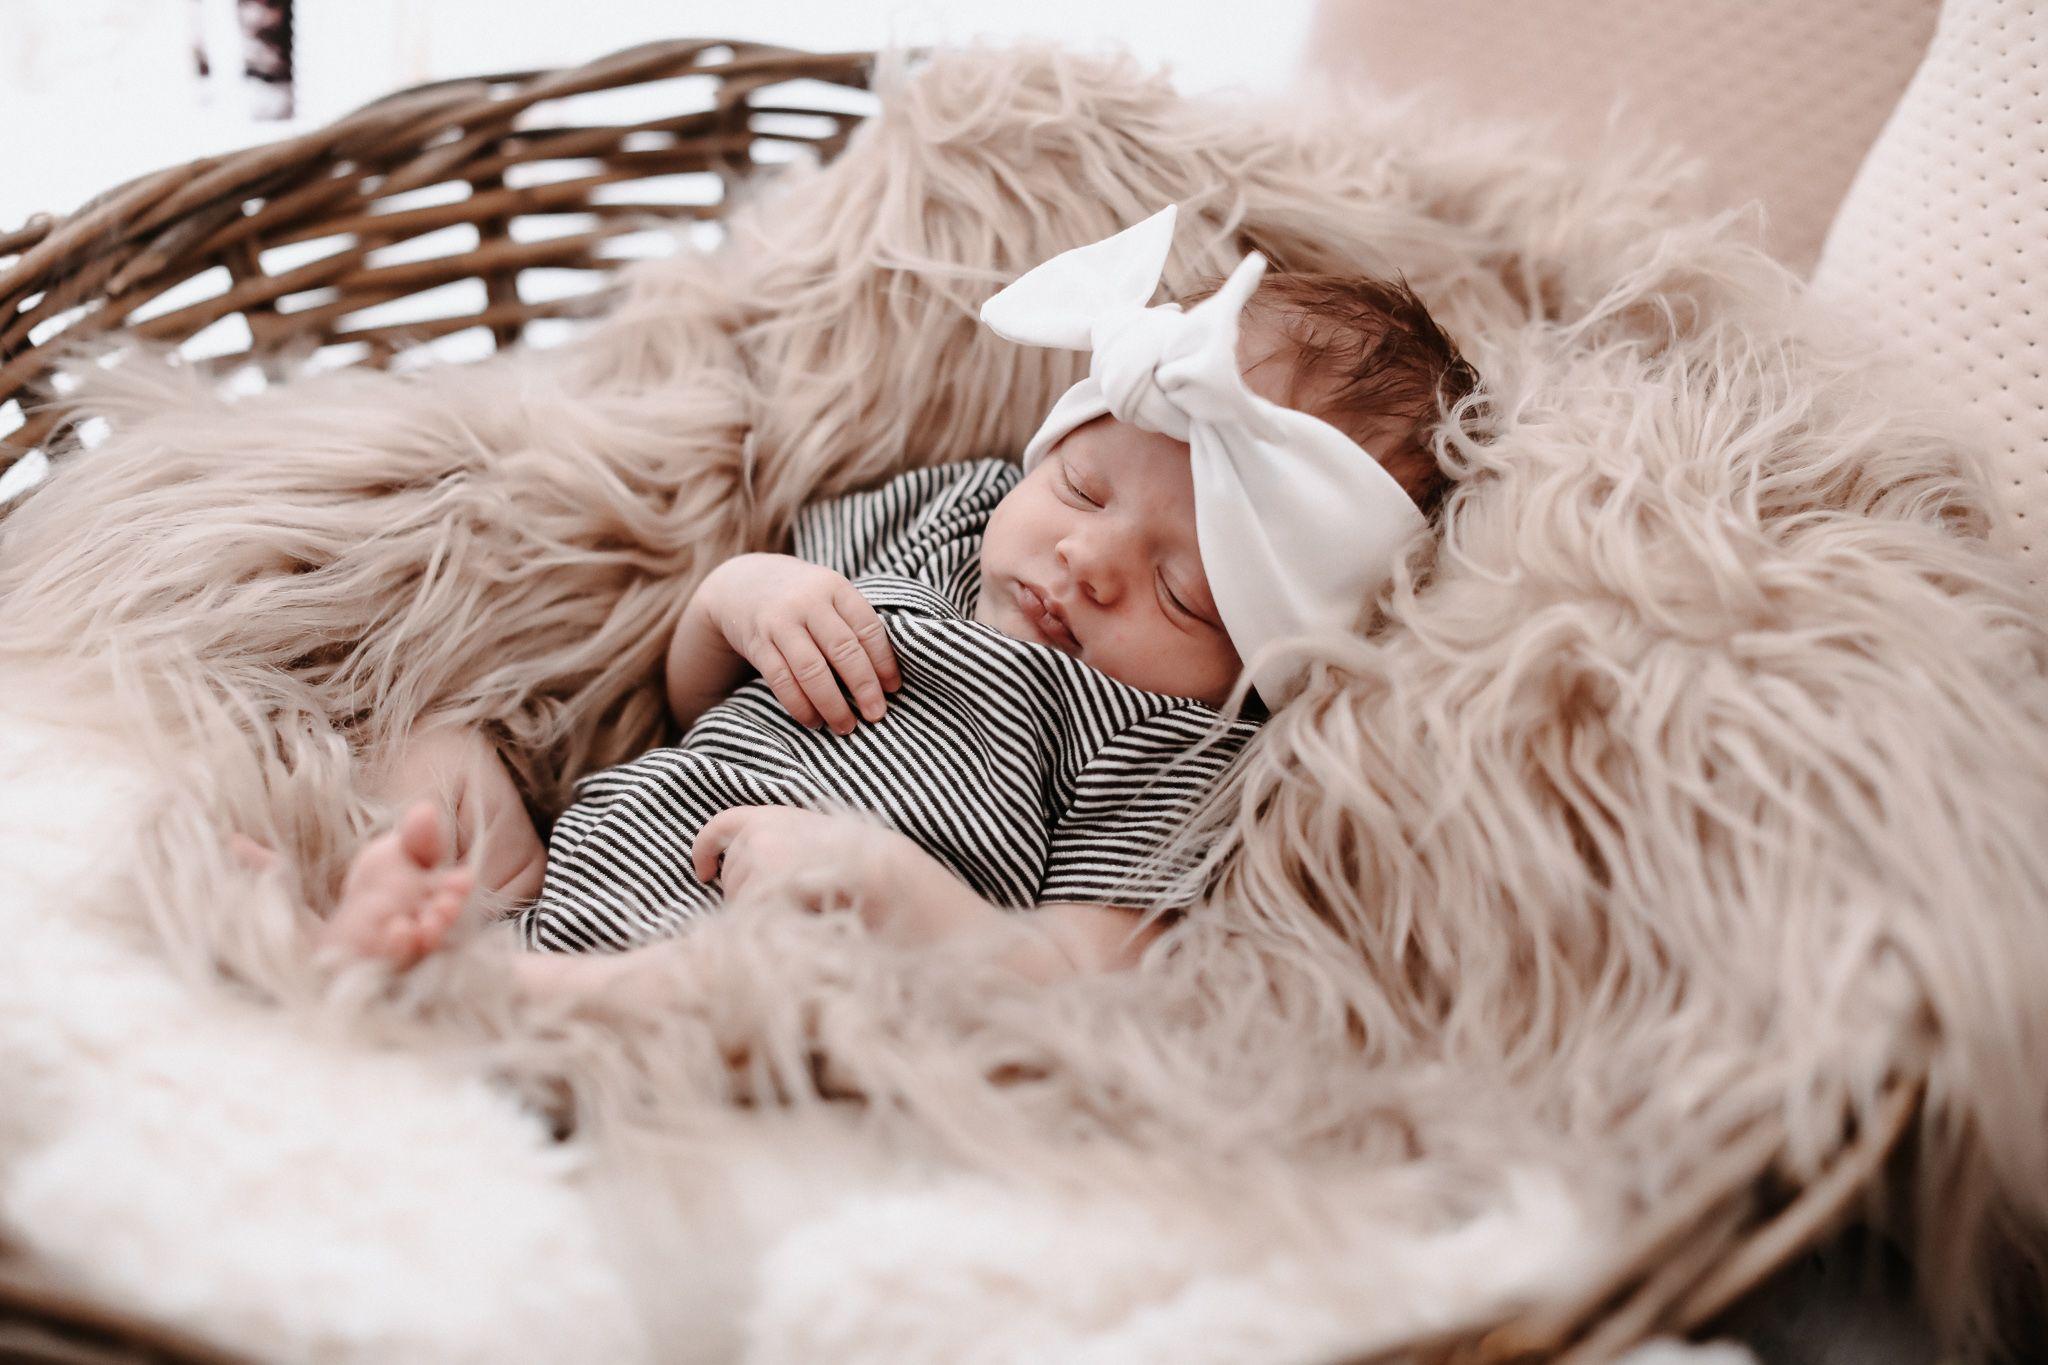 Babyshooting Hagen Babyfotografie - Babyfotograf Hagen lovely wild moments